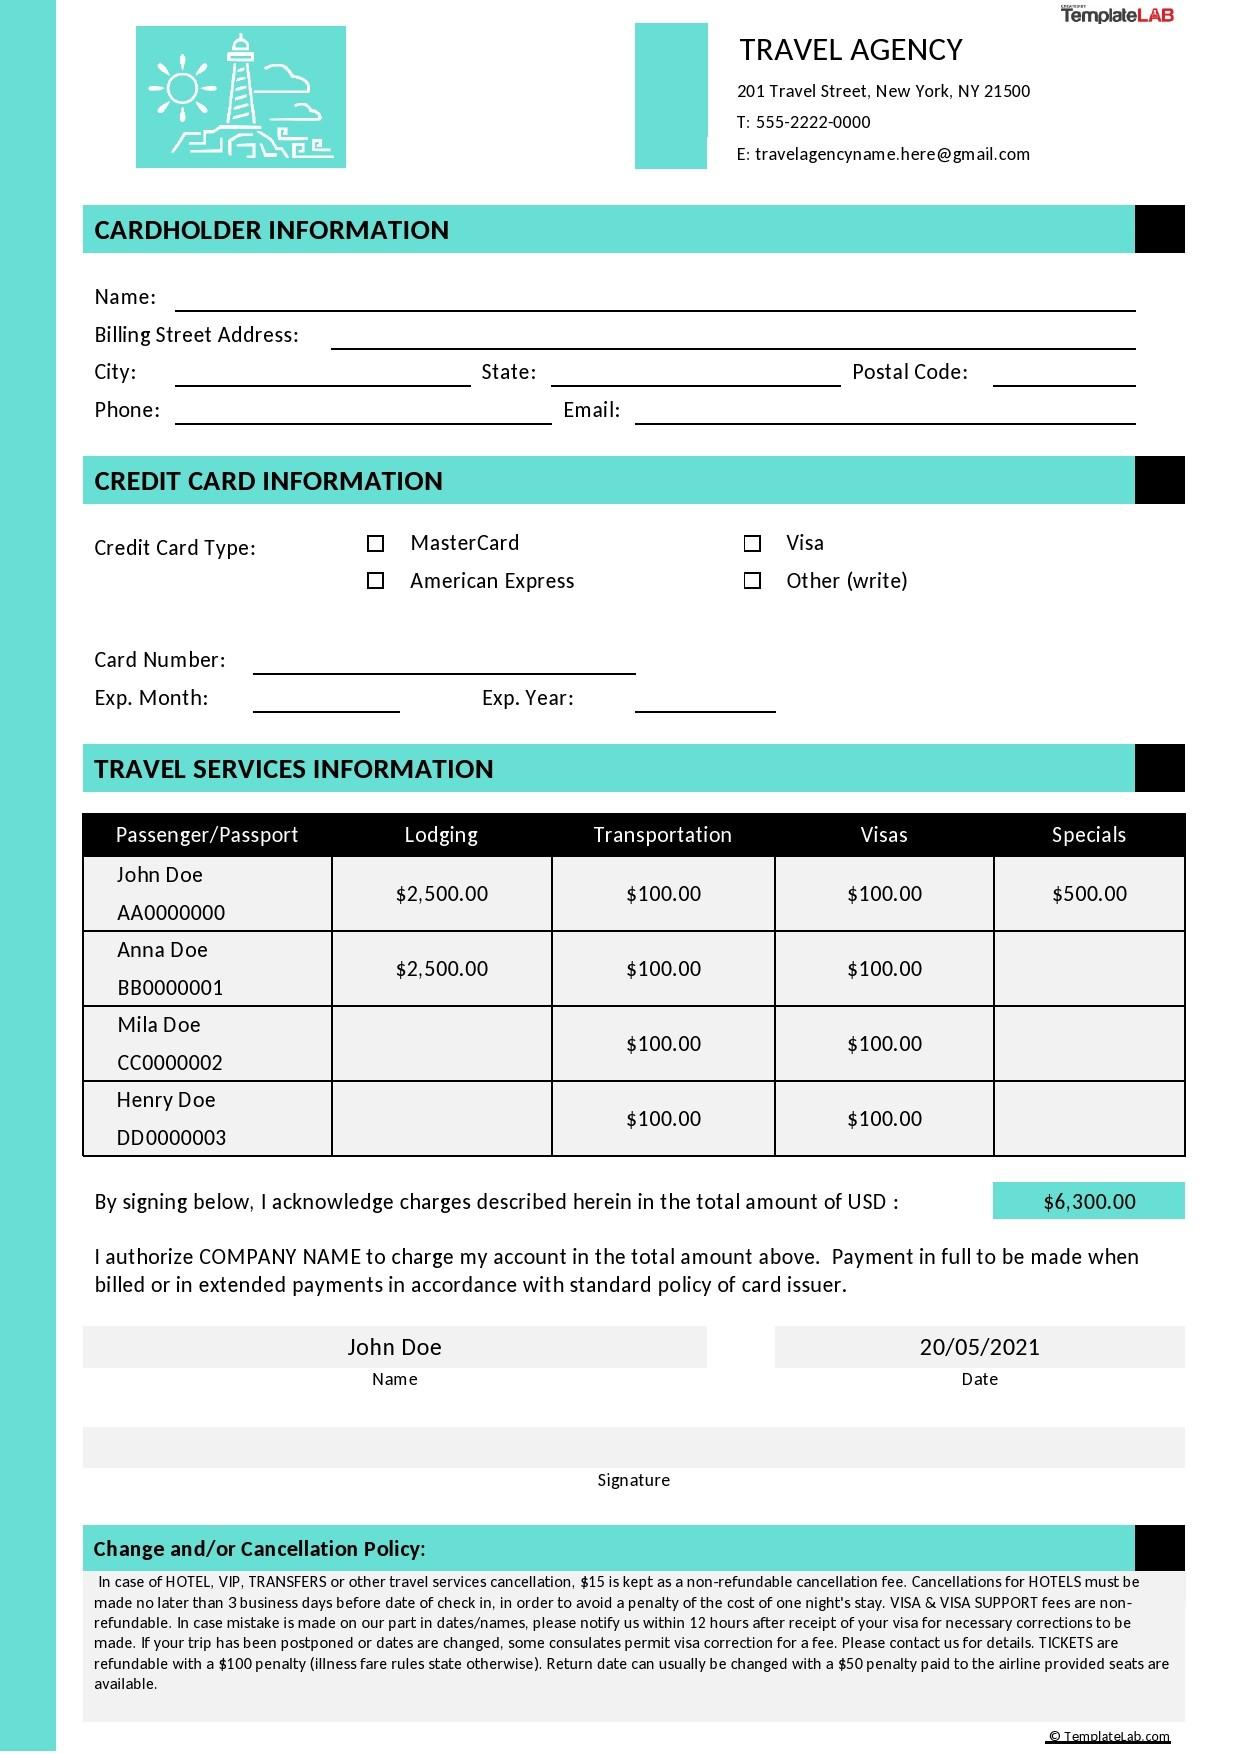 Free Travel Agent Credit Card Authorization Form - TemplateLab.com